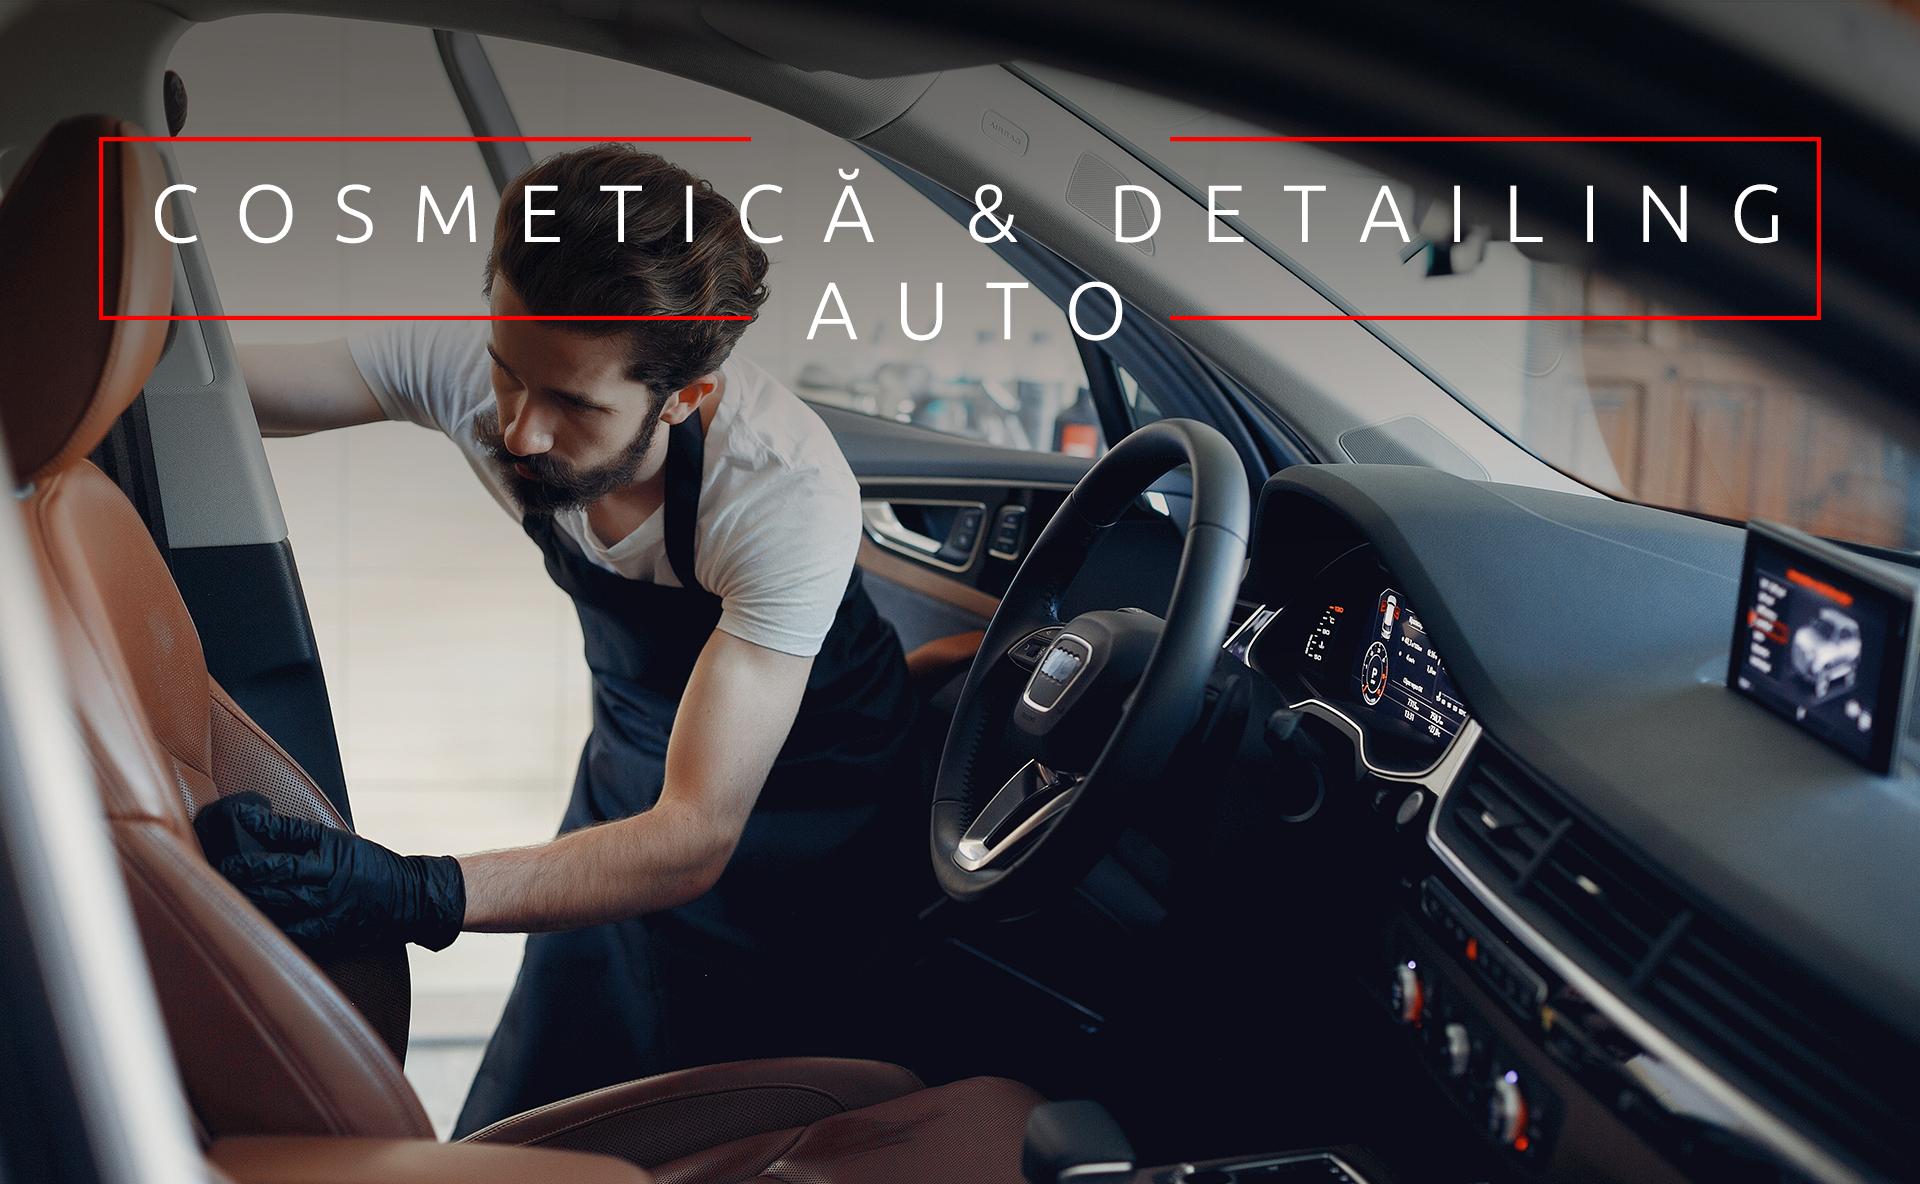 Cosmetica&detailing auto interior